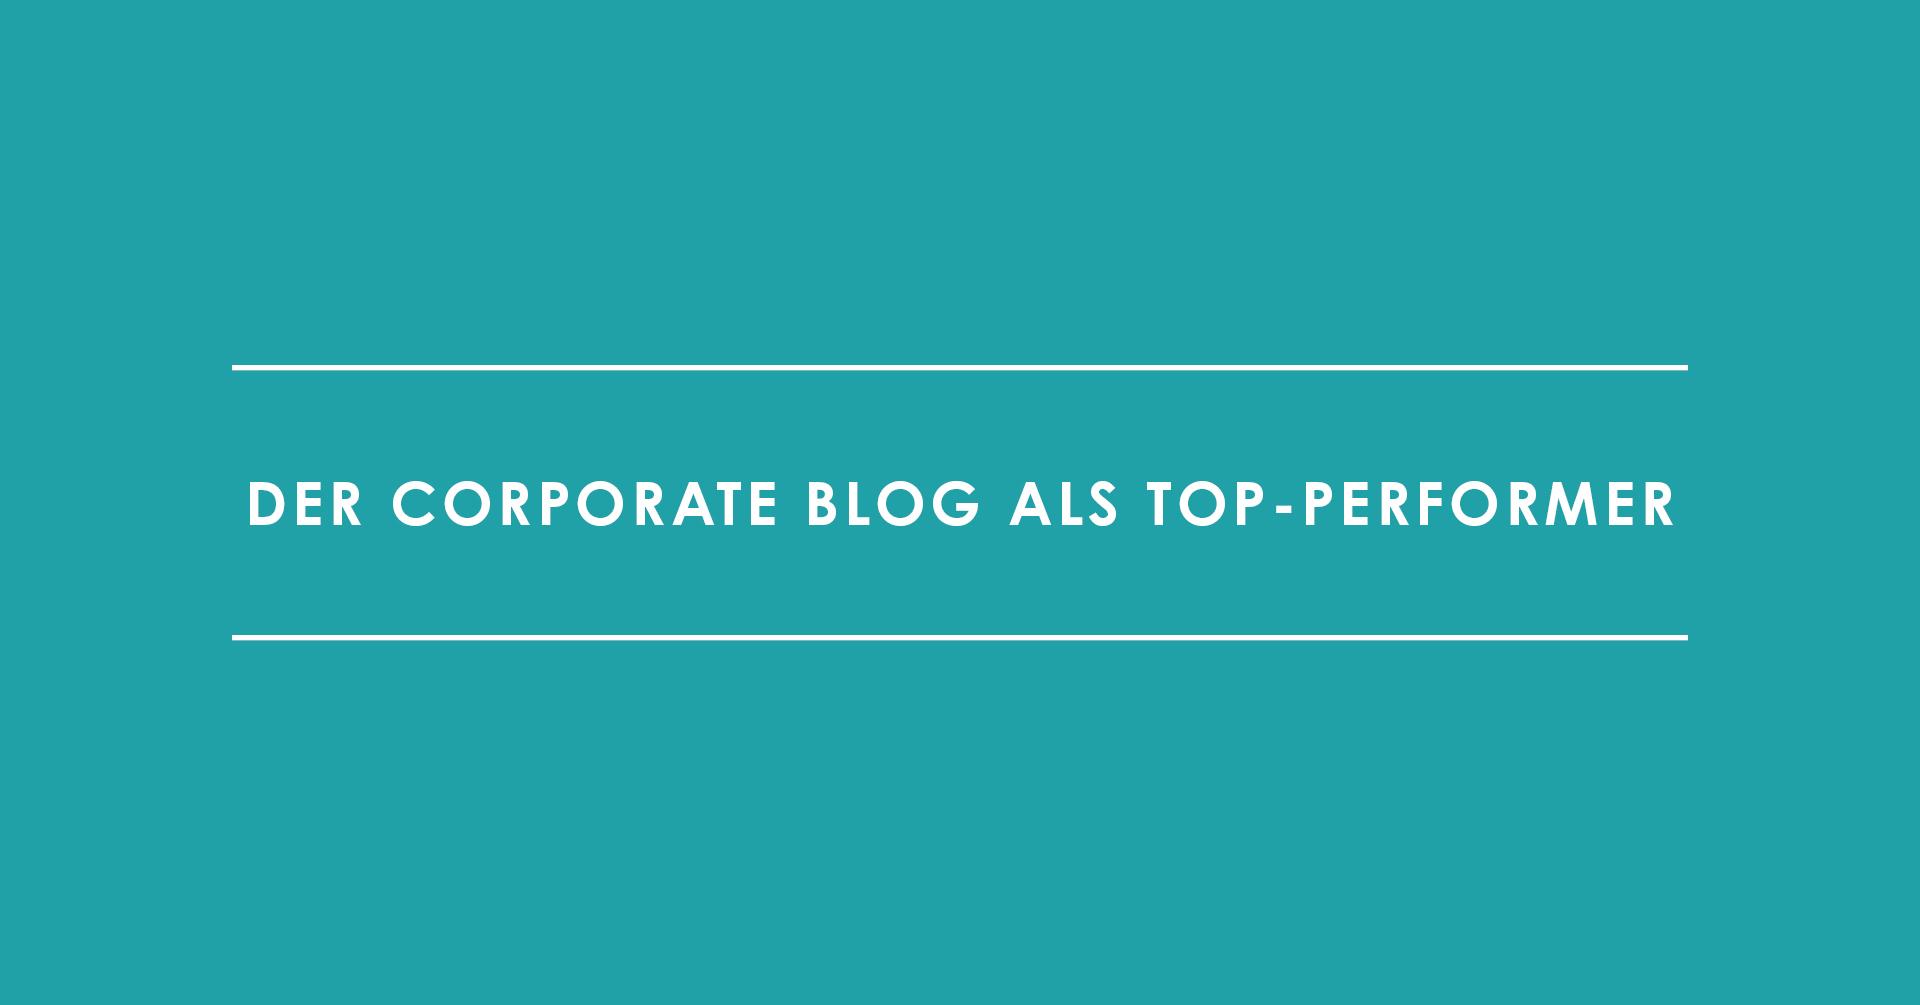 Der Corporate Blog als Top-Performer